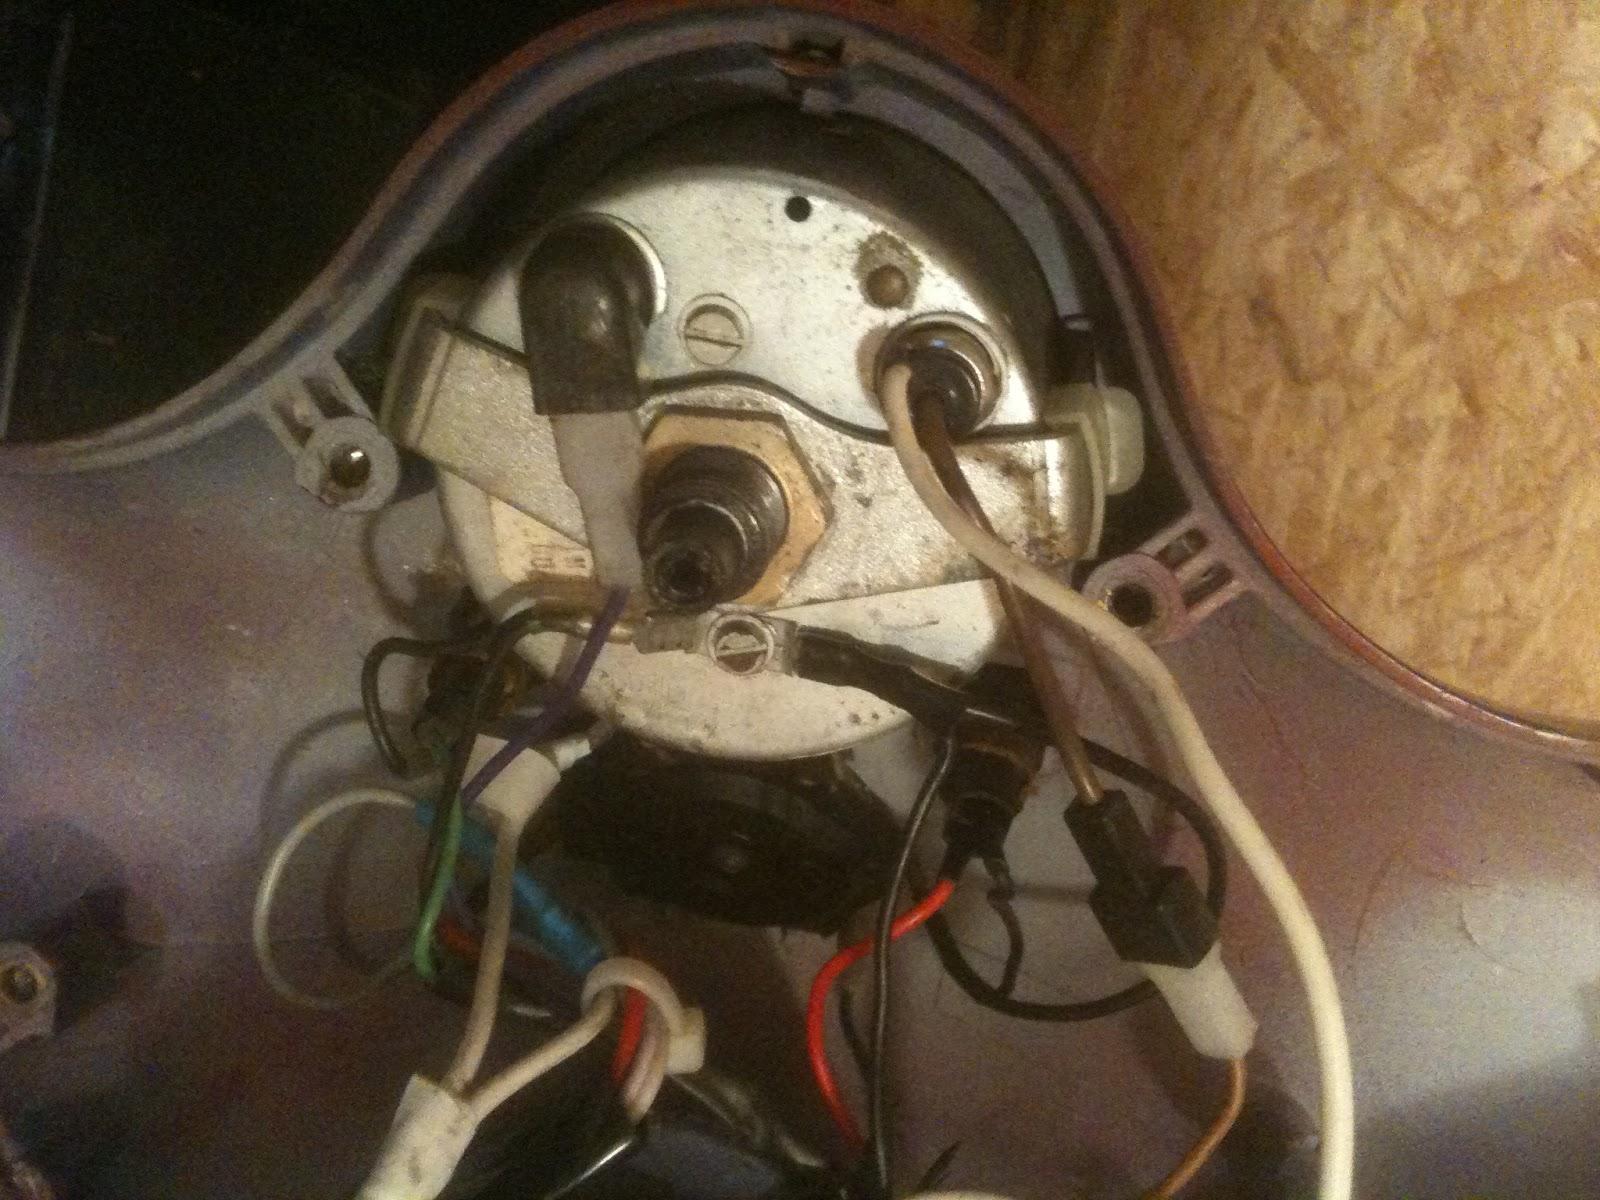 1980 Vespa P200e Wiring Diagram Vespa Tinkering Sip Speedometer Install On 1980 Vespa P200e